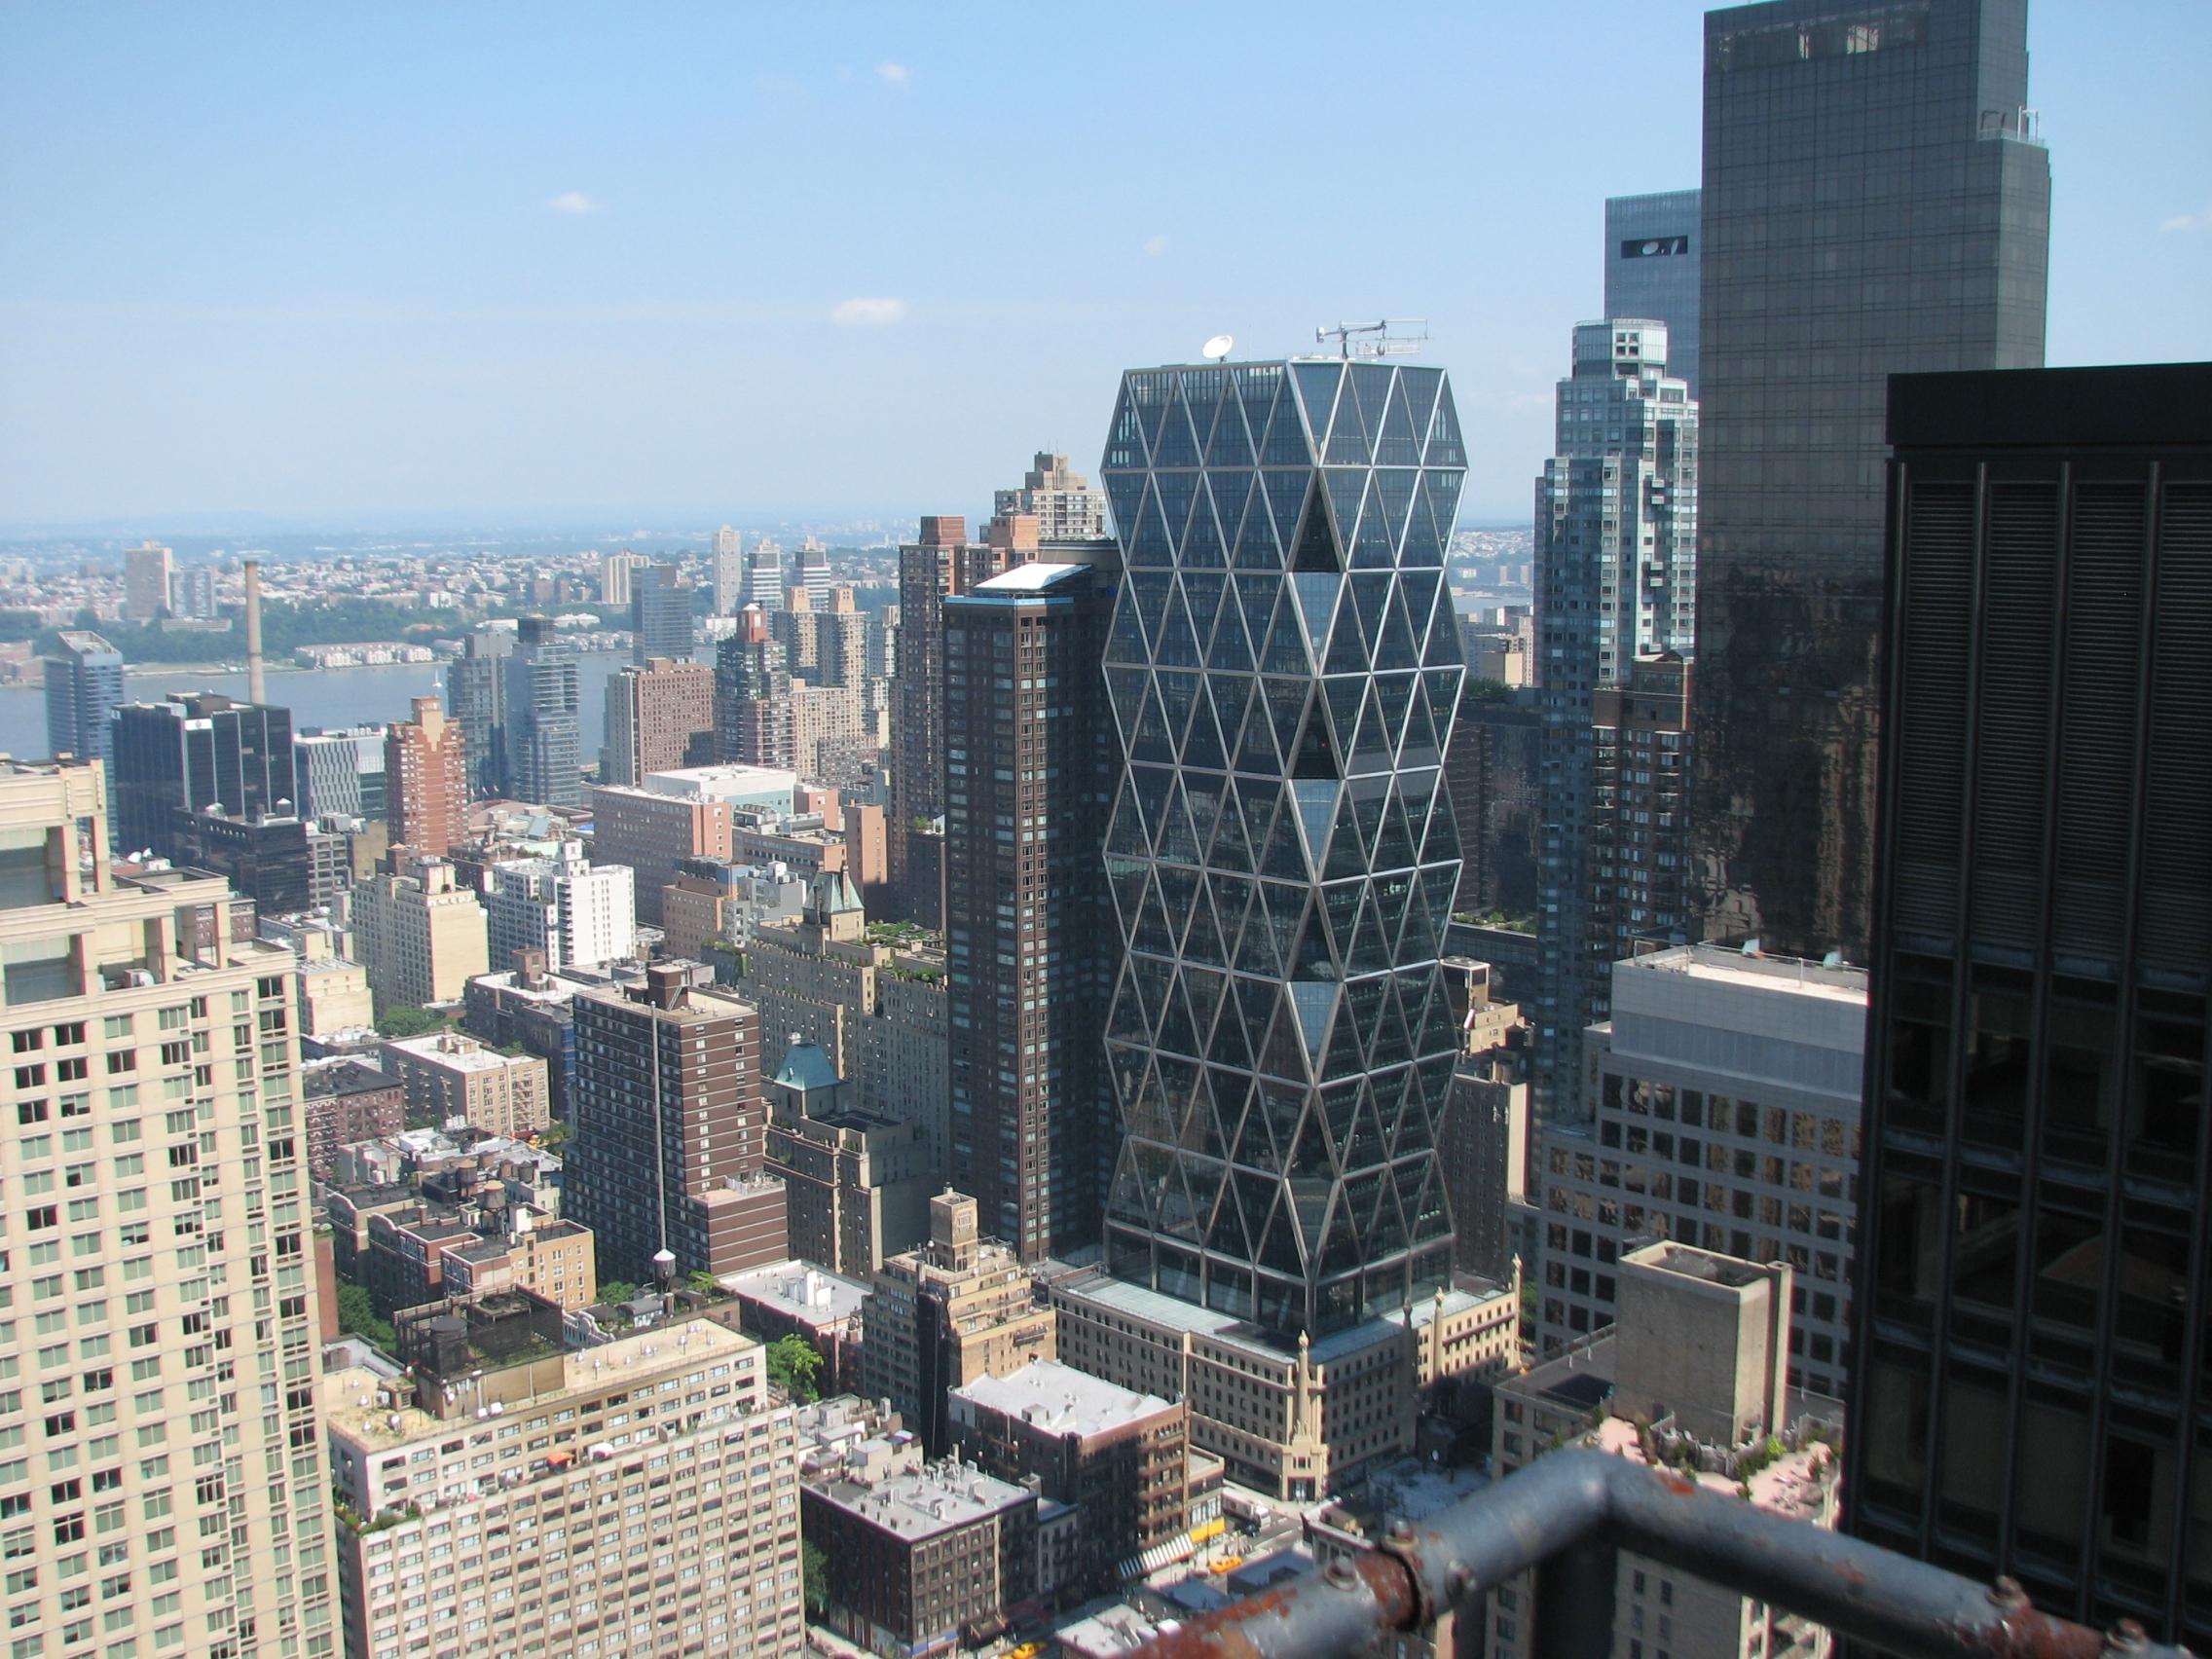 Здание корпорации Hearst в Нью-Йорке.  Архитектор Норман Фостер